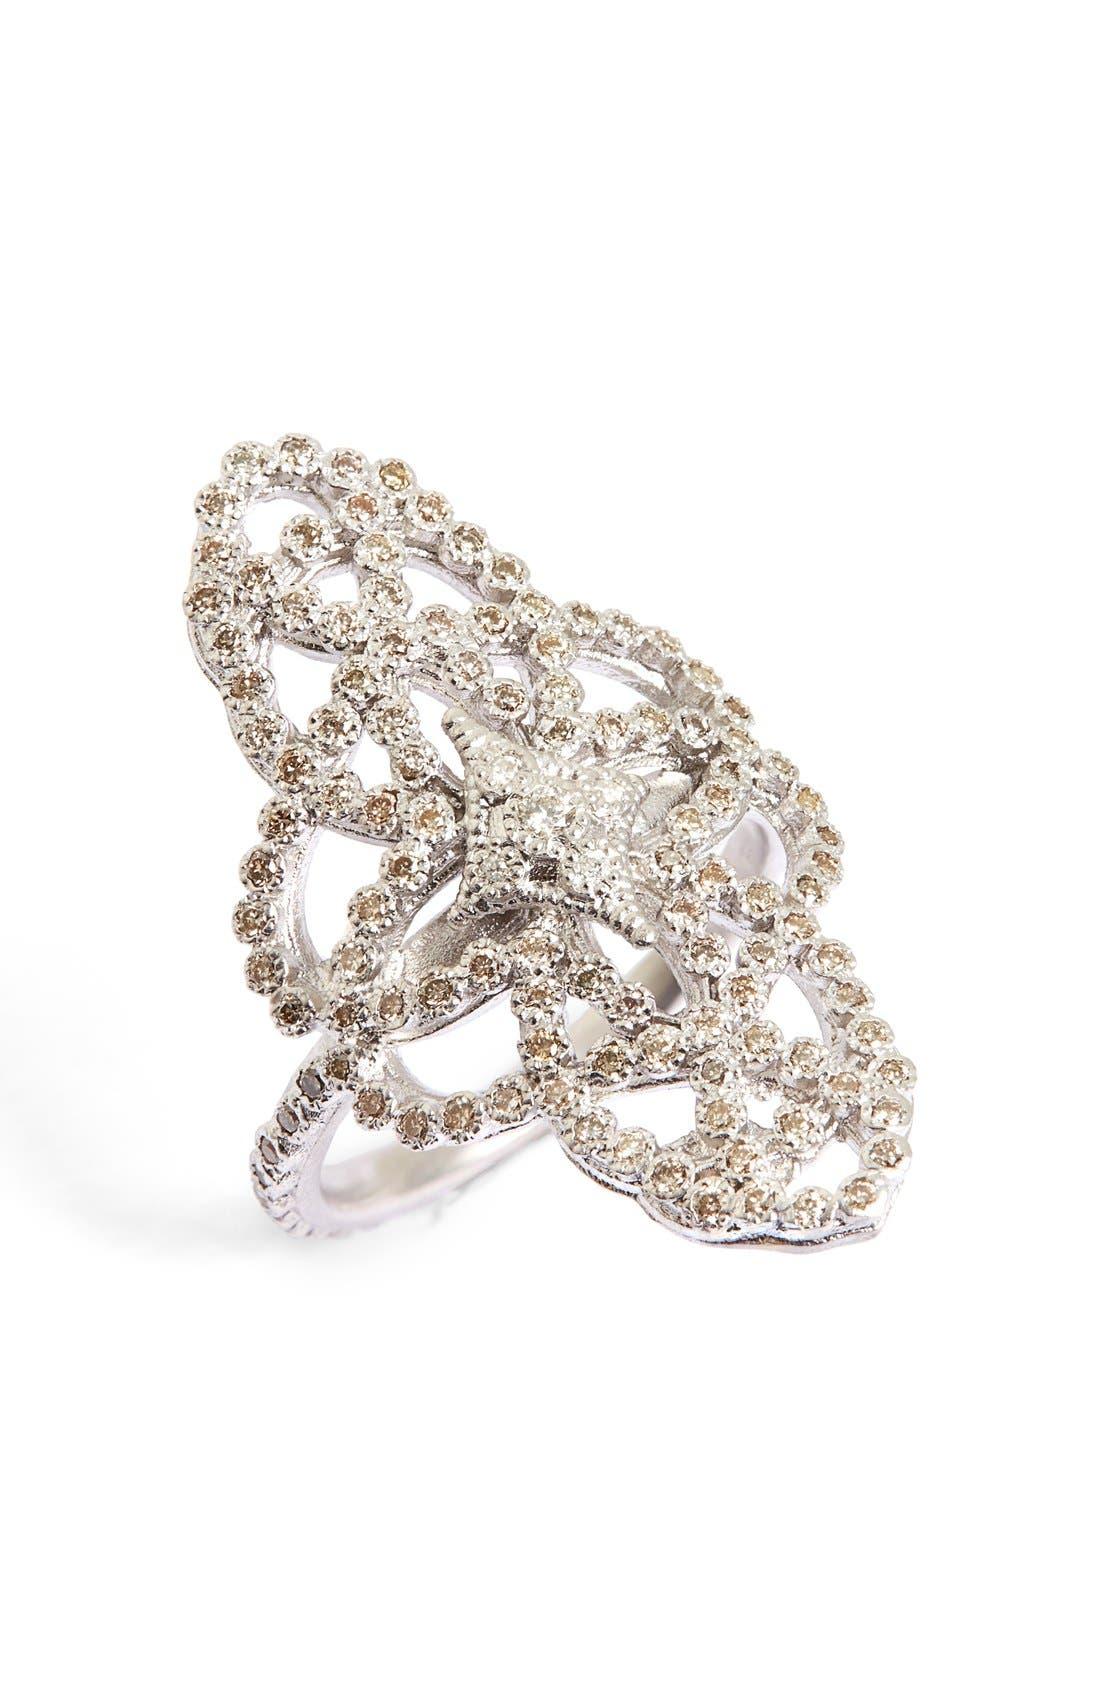 Main Image - Armenta New World Crivelli Eternity Diamond Ring